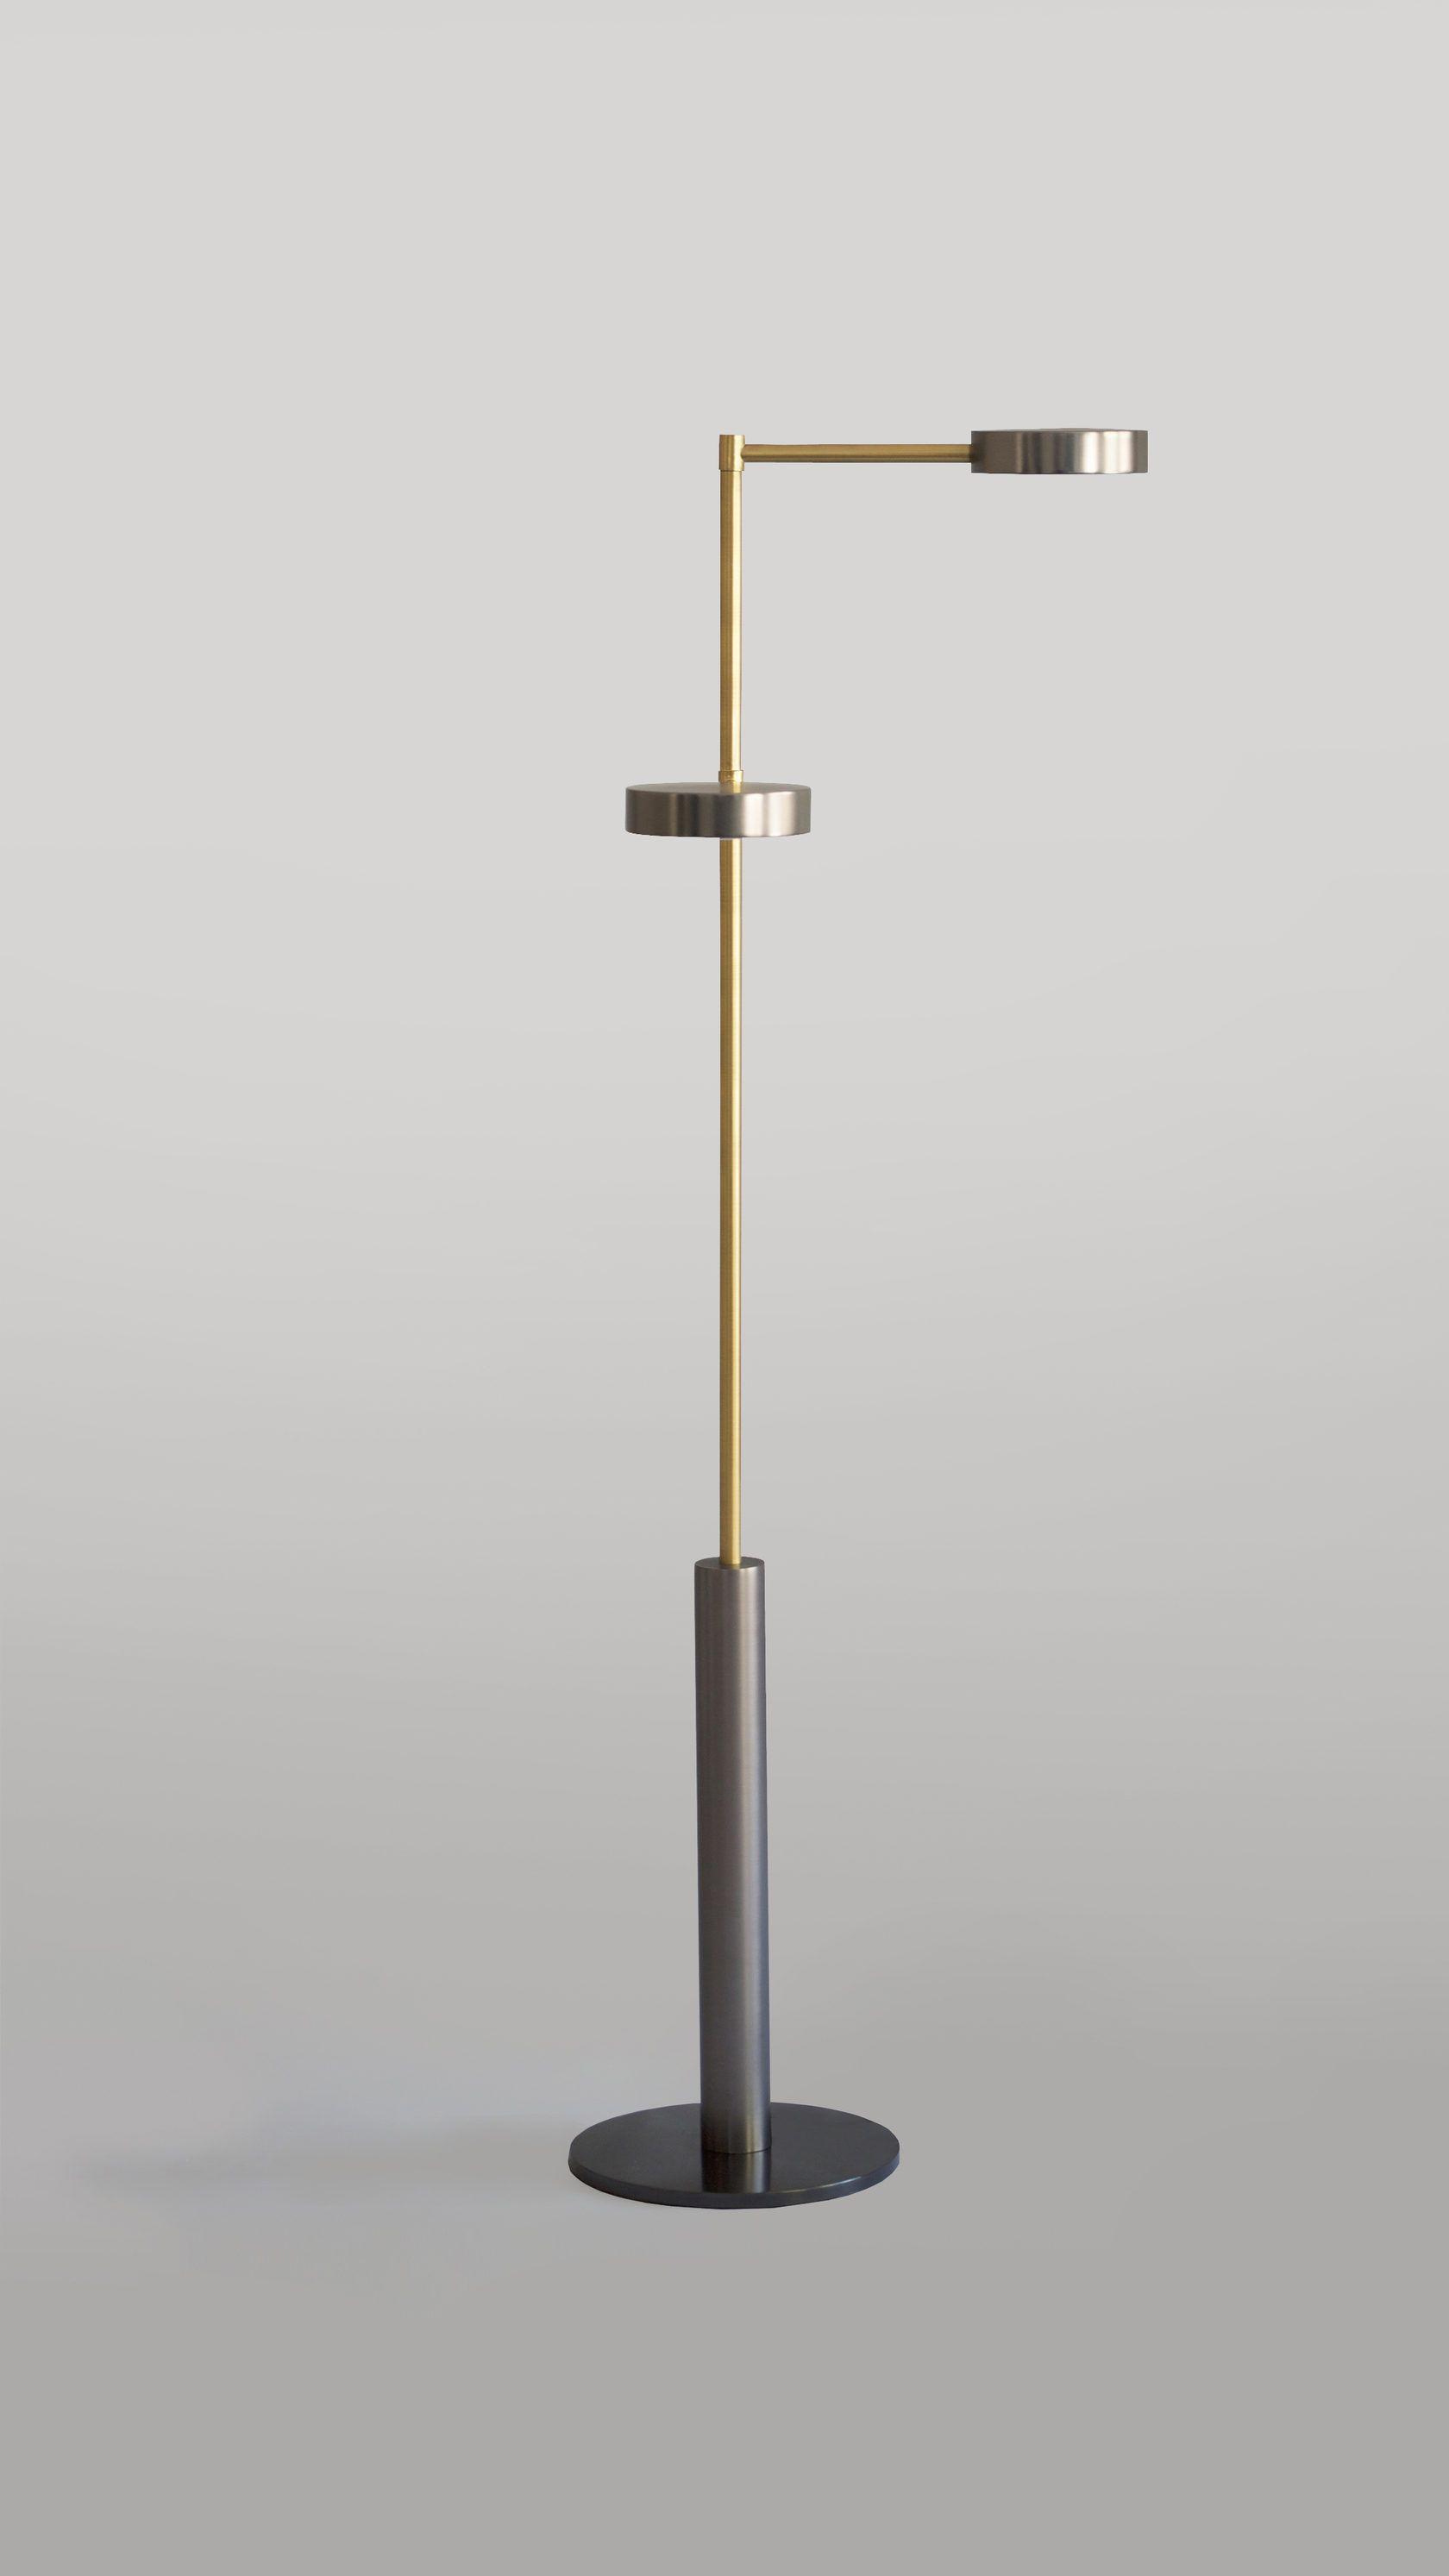 Pin By Tiffany Sim On Lights Floor Lamp Cylinder Floor Lamp Lamp